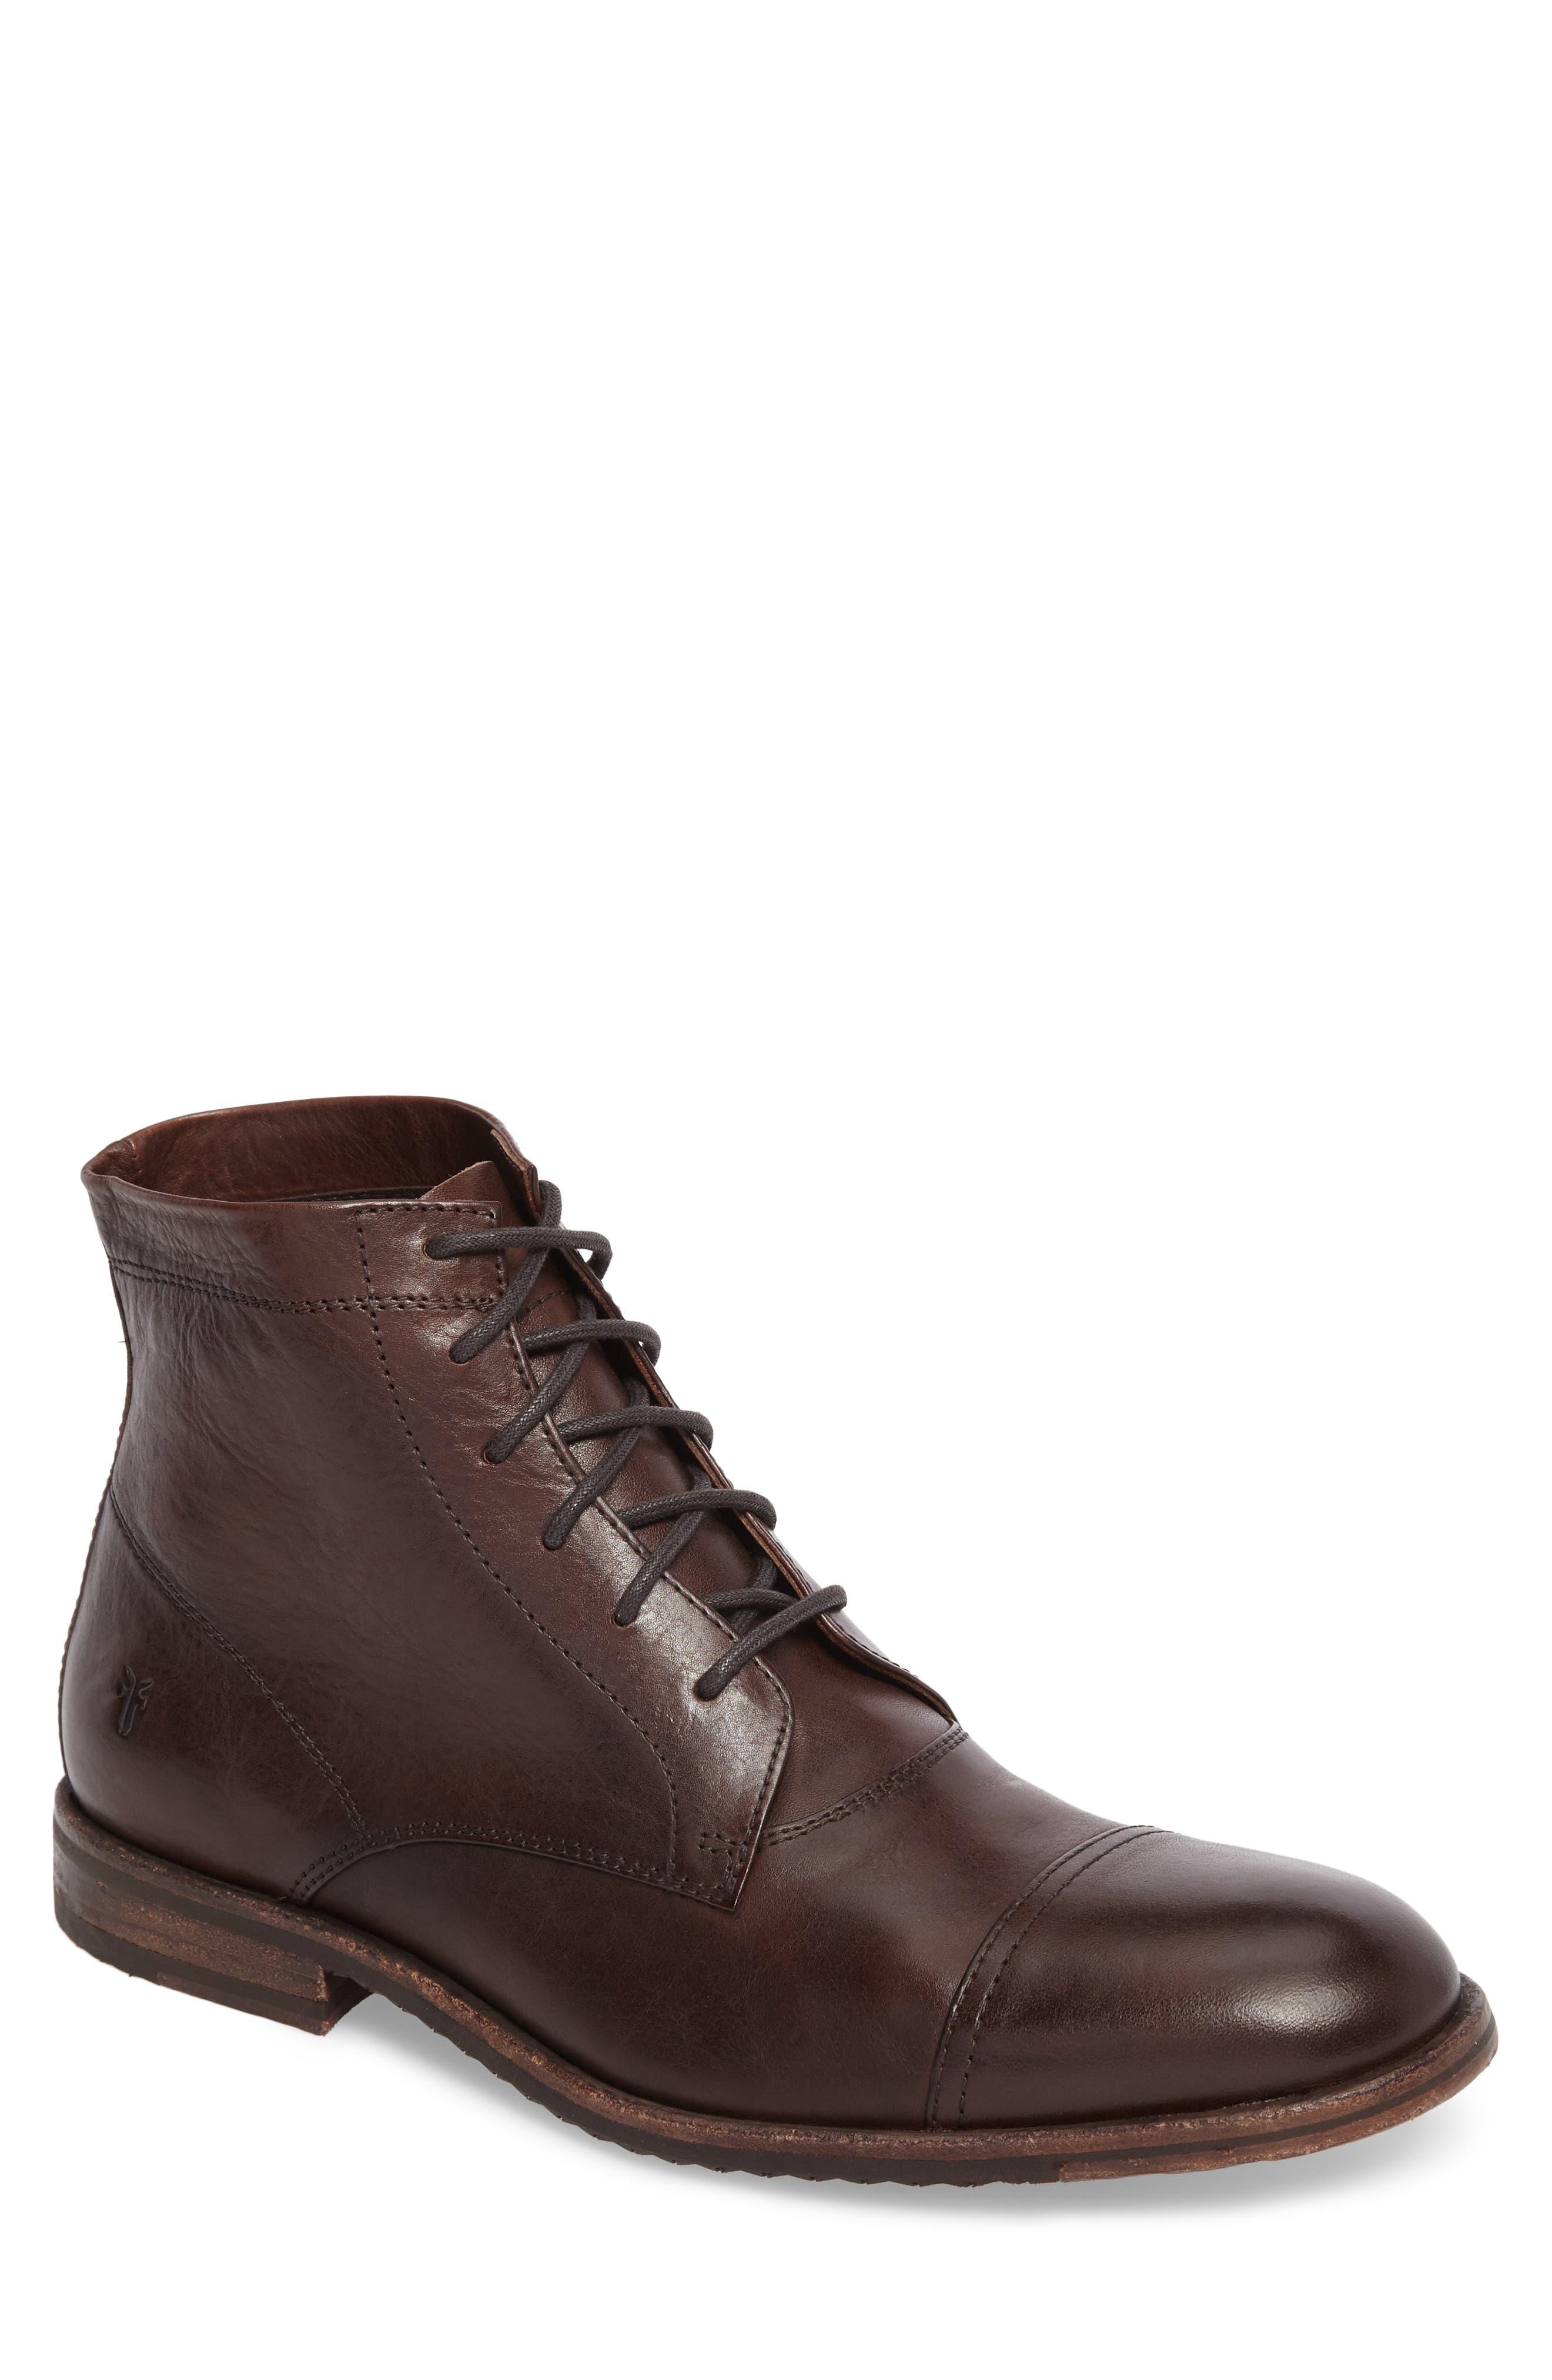 Sam Cap Toe Boot,                         Main,                         color, 200